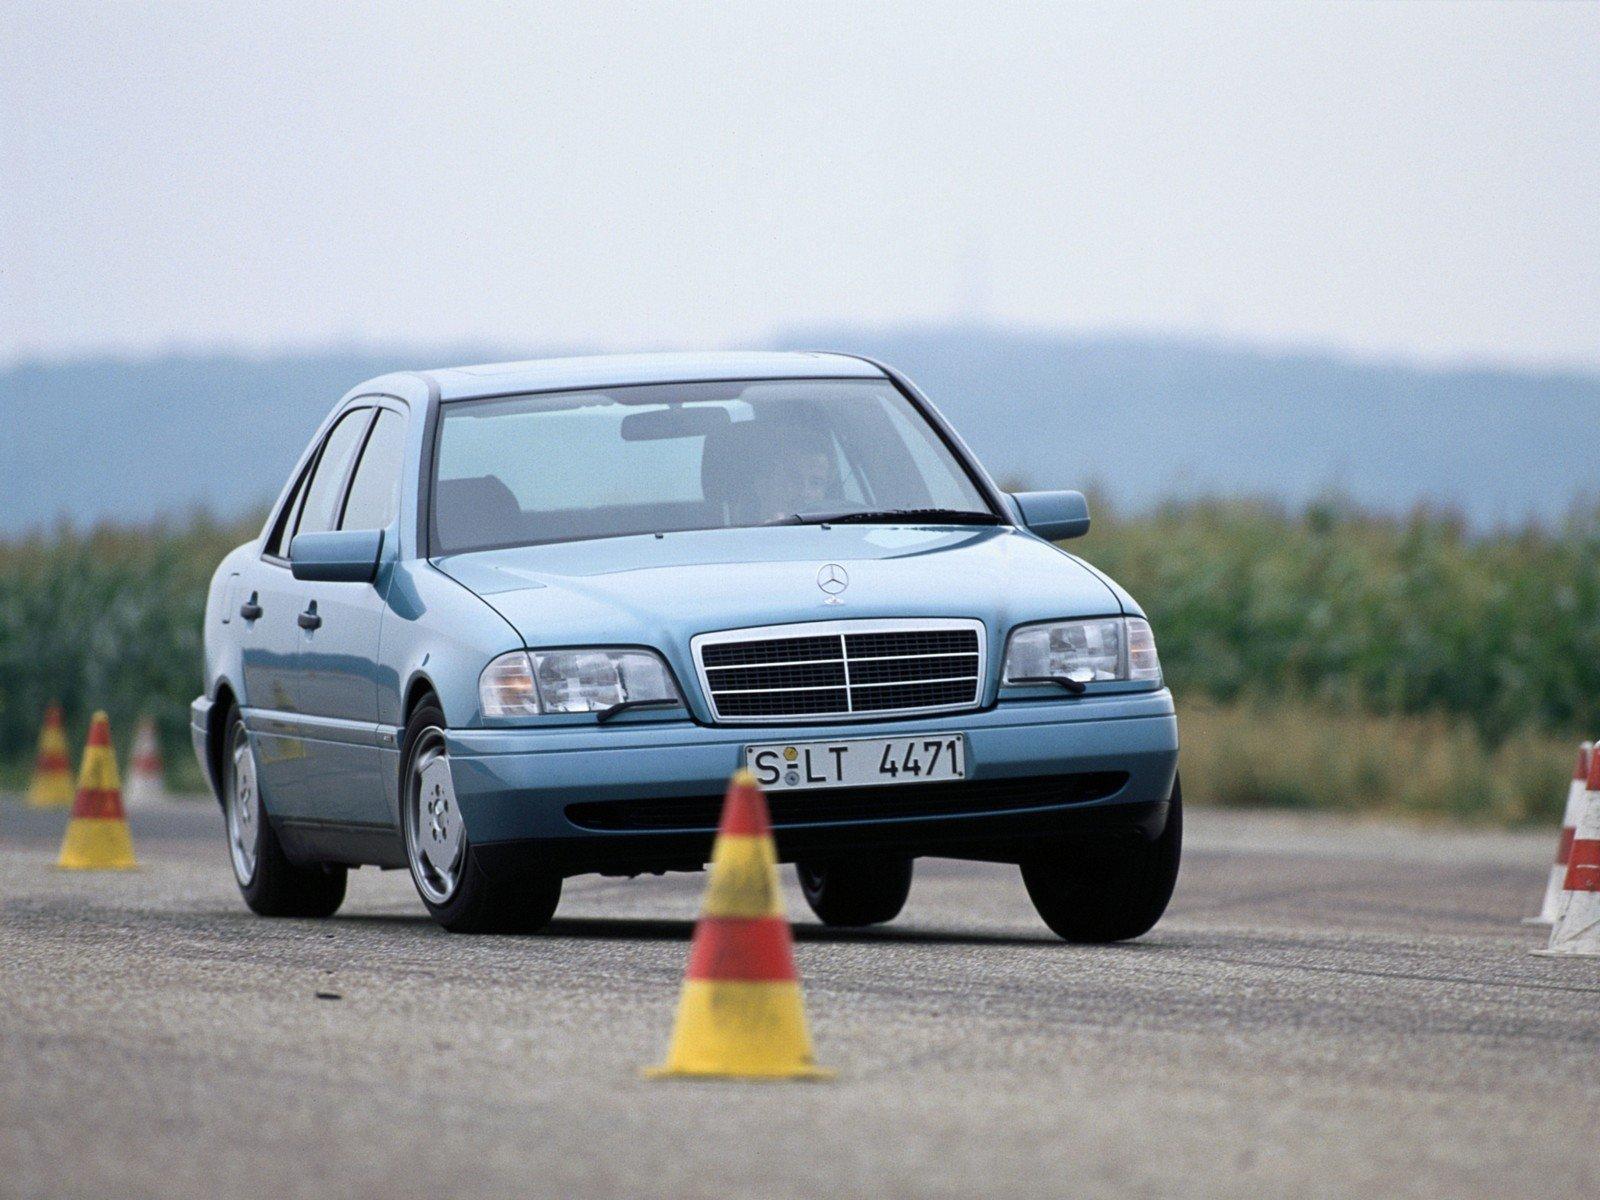 Mercedes-Benz C-Class (W202) — описание модели